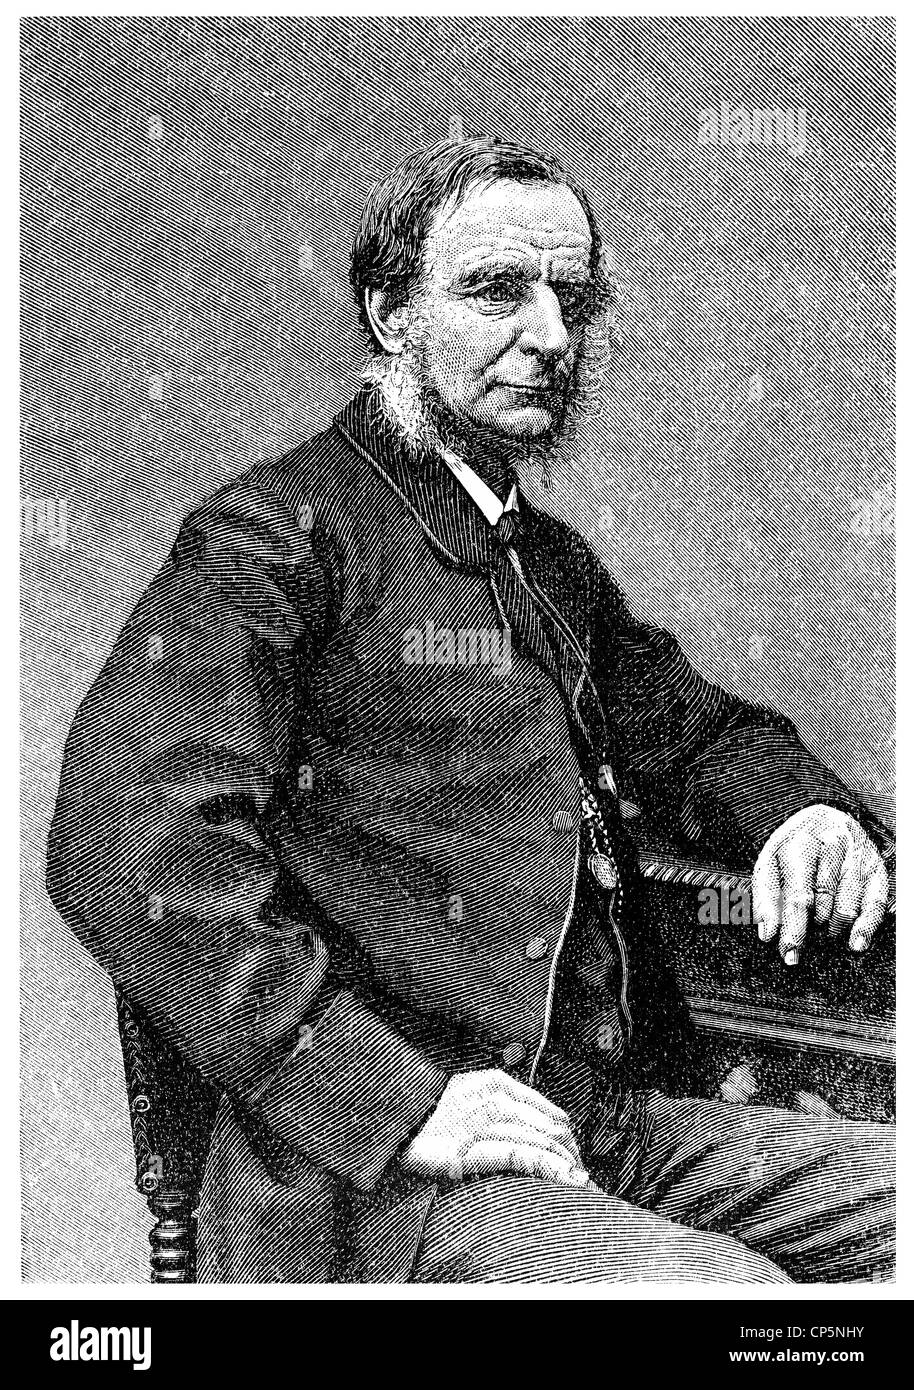 Charles Kingsley, 1819 - 1875, an English theologian and writer, - Stock Image